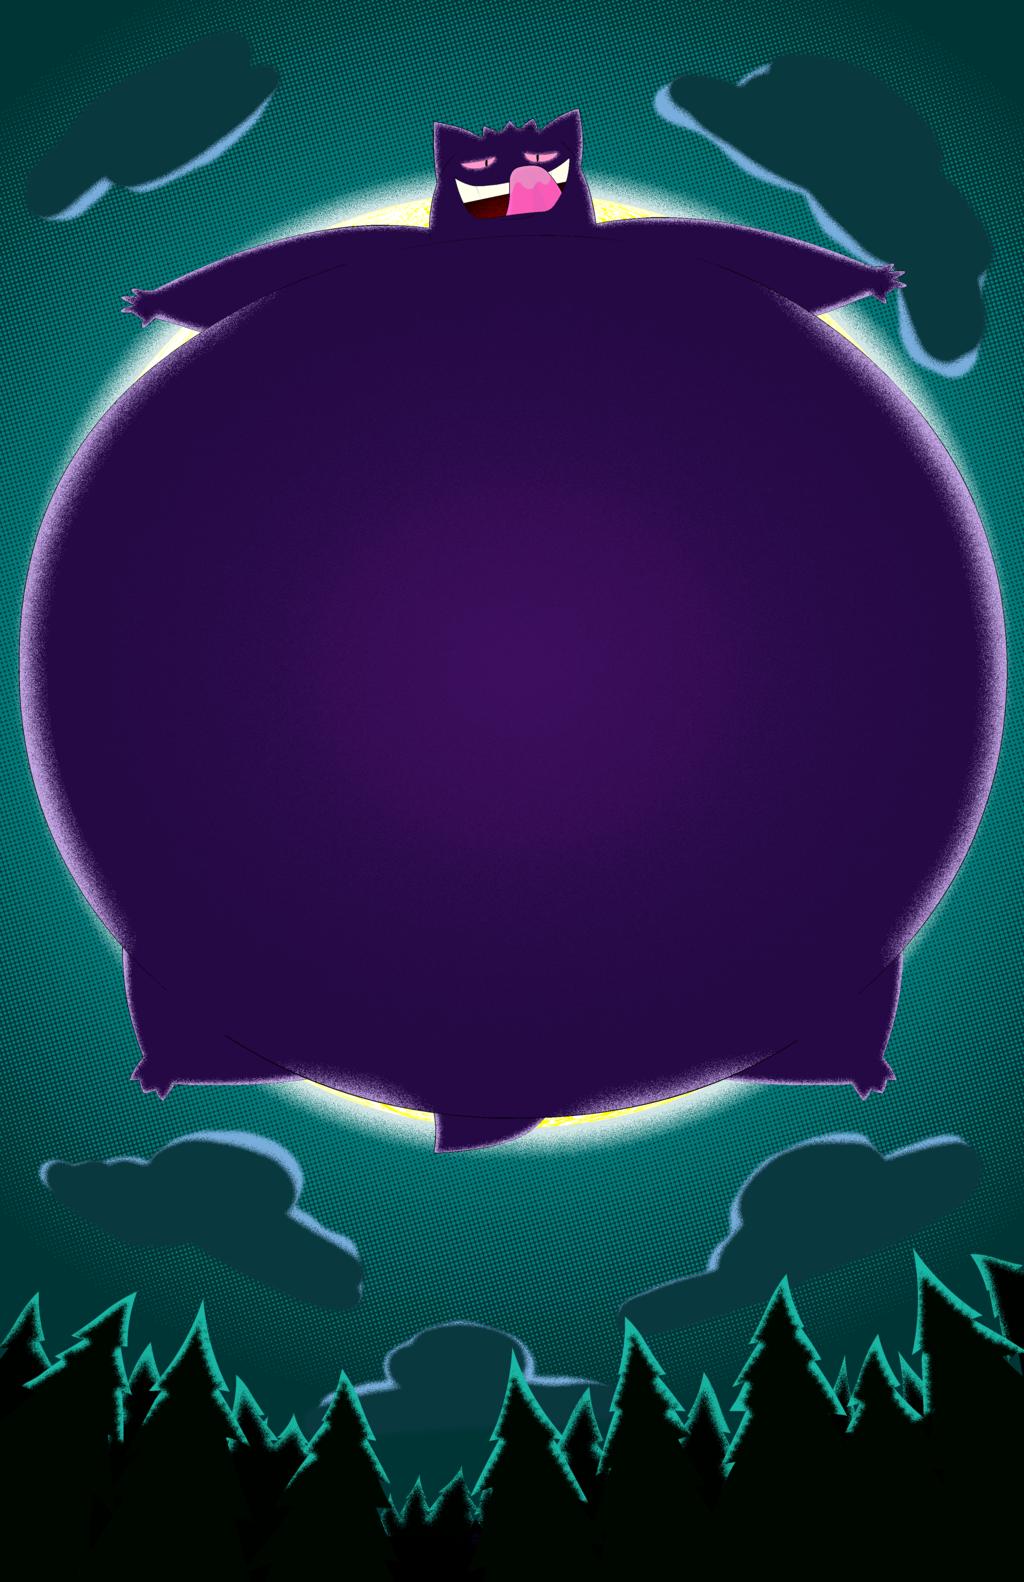 Most recent image: A Gengar Eclipse